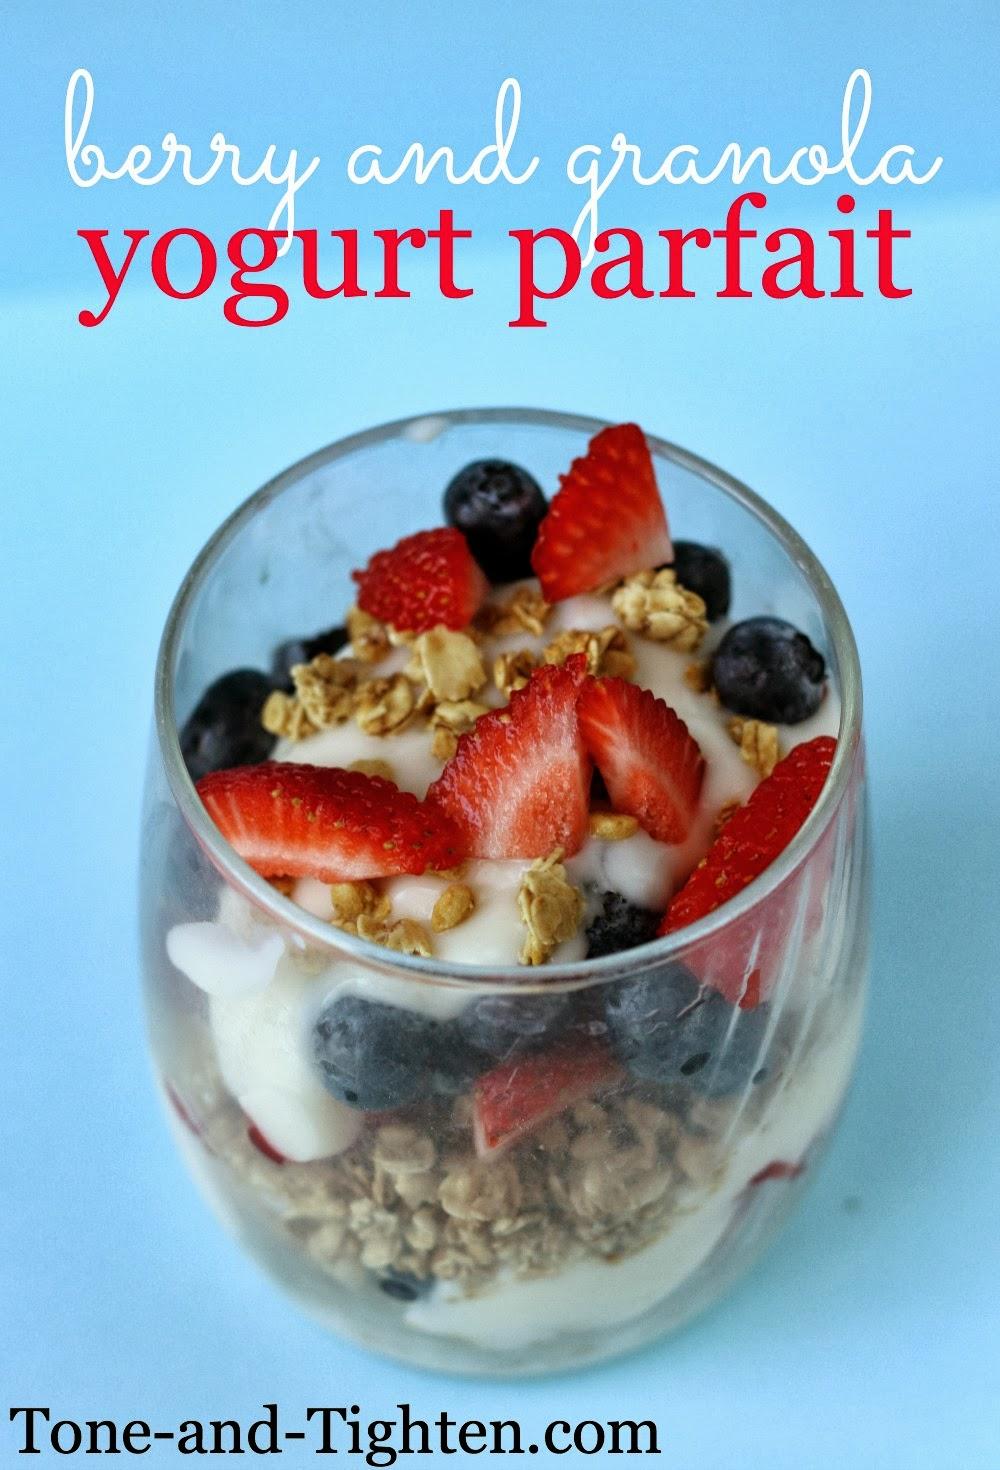 Berry and Granola Yogurt Parfait Recipe | Tone and Tighten